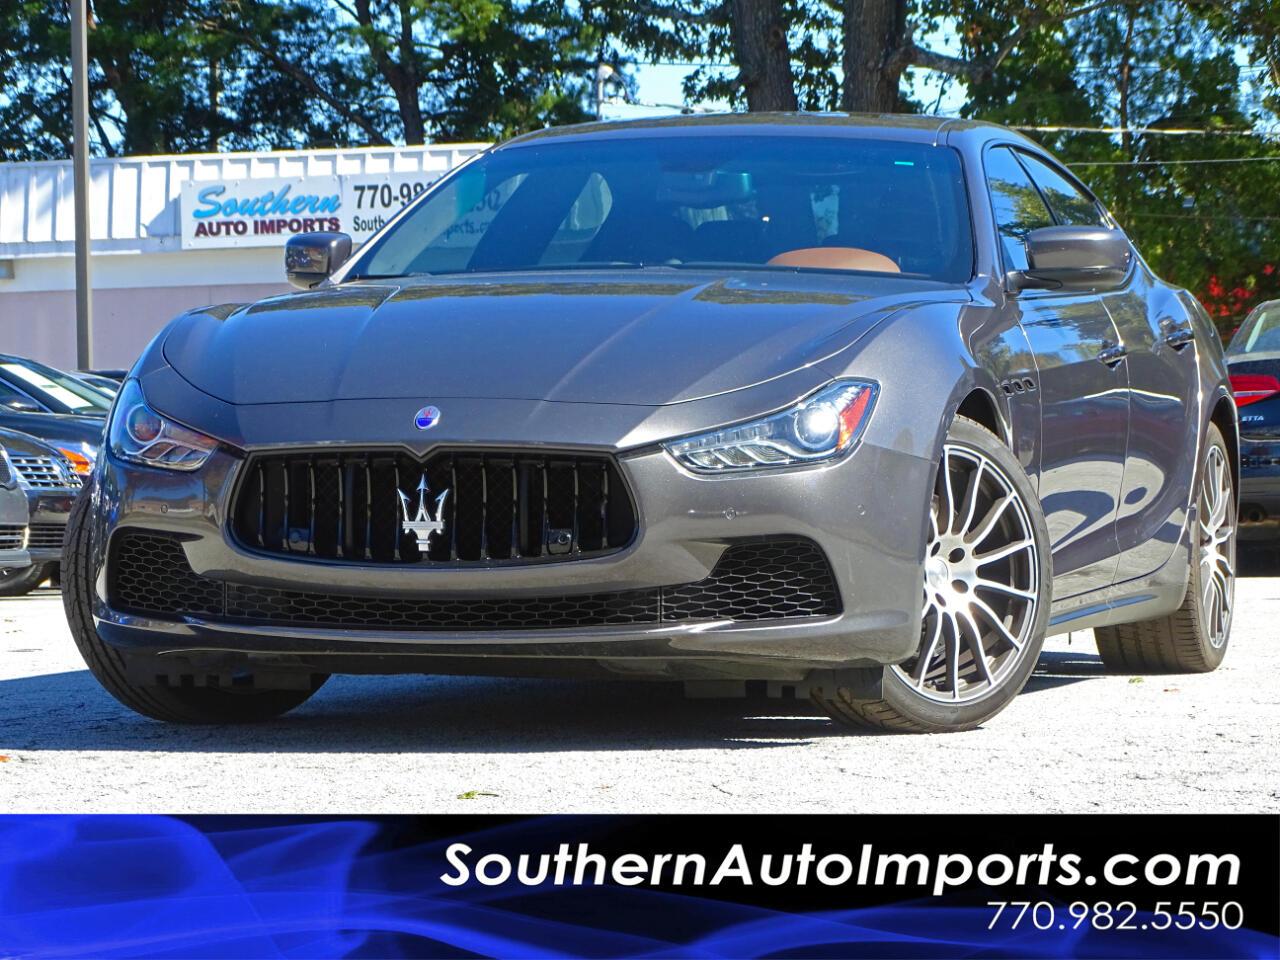 2016 Maserati Ghibli S Pkg w/Sport Wheels Navigation 1owner